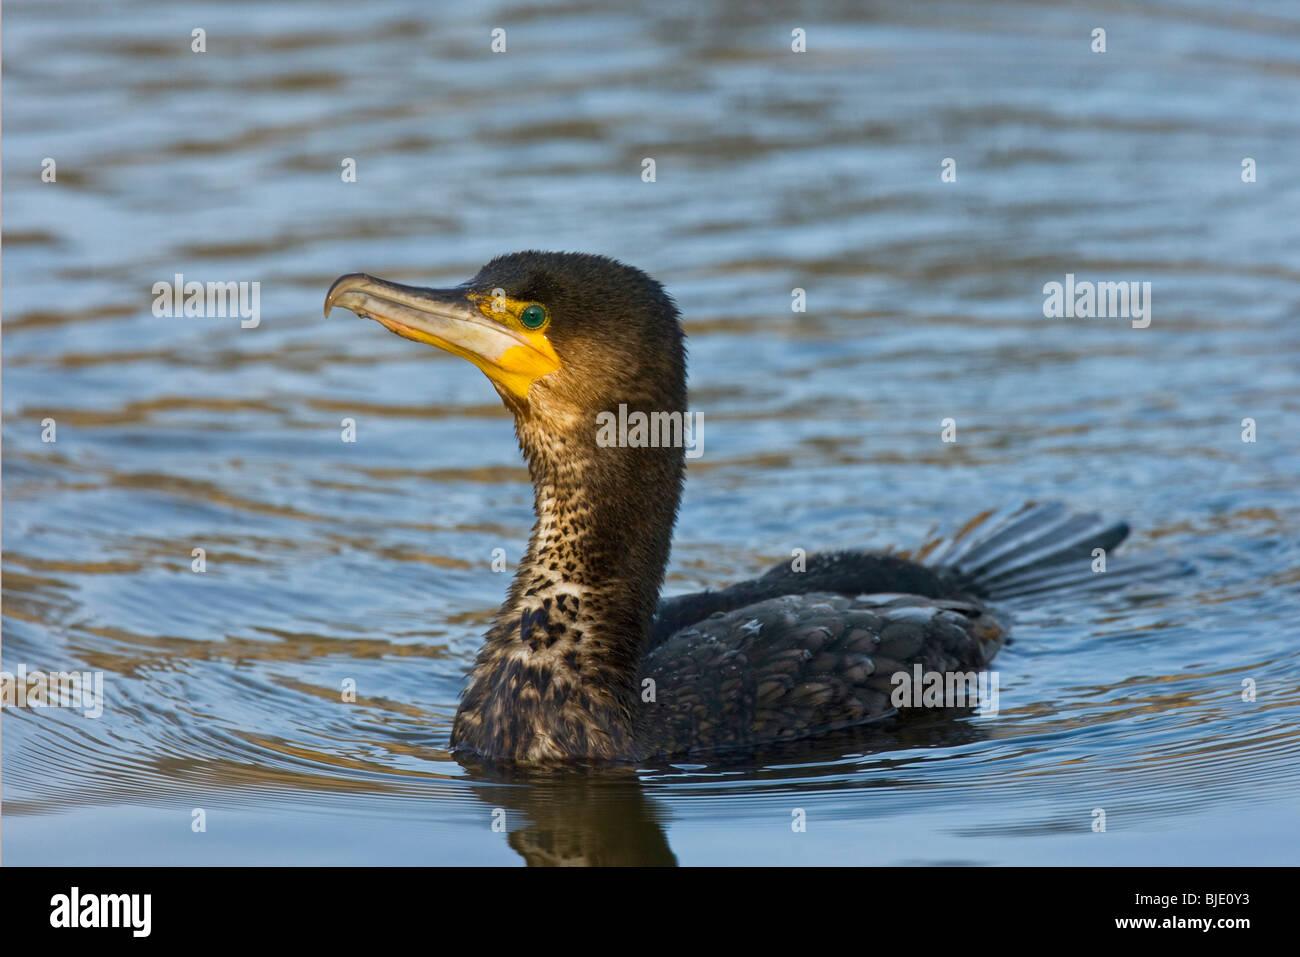 Great cormorant (Phalacrocorax carbo) swimming in lake - Stock Image